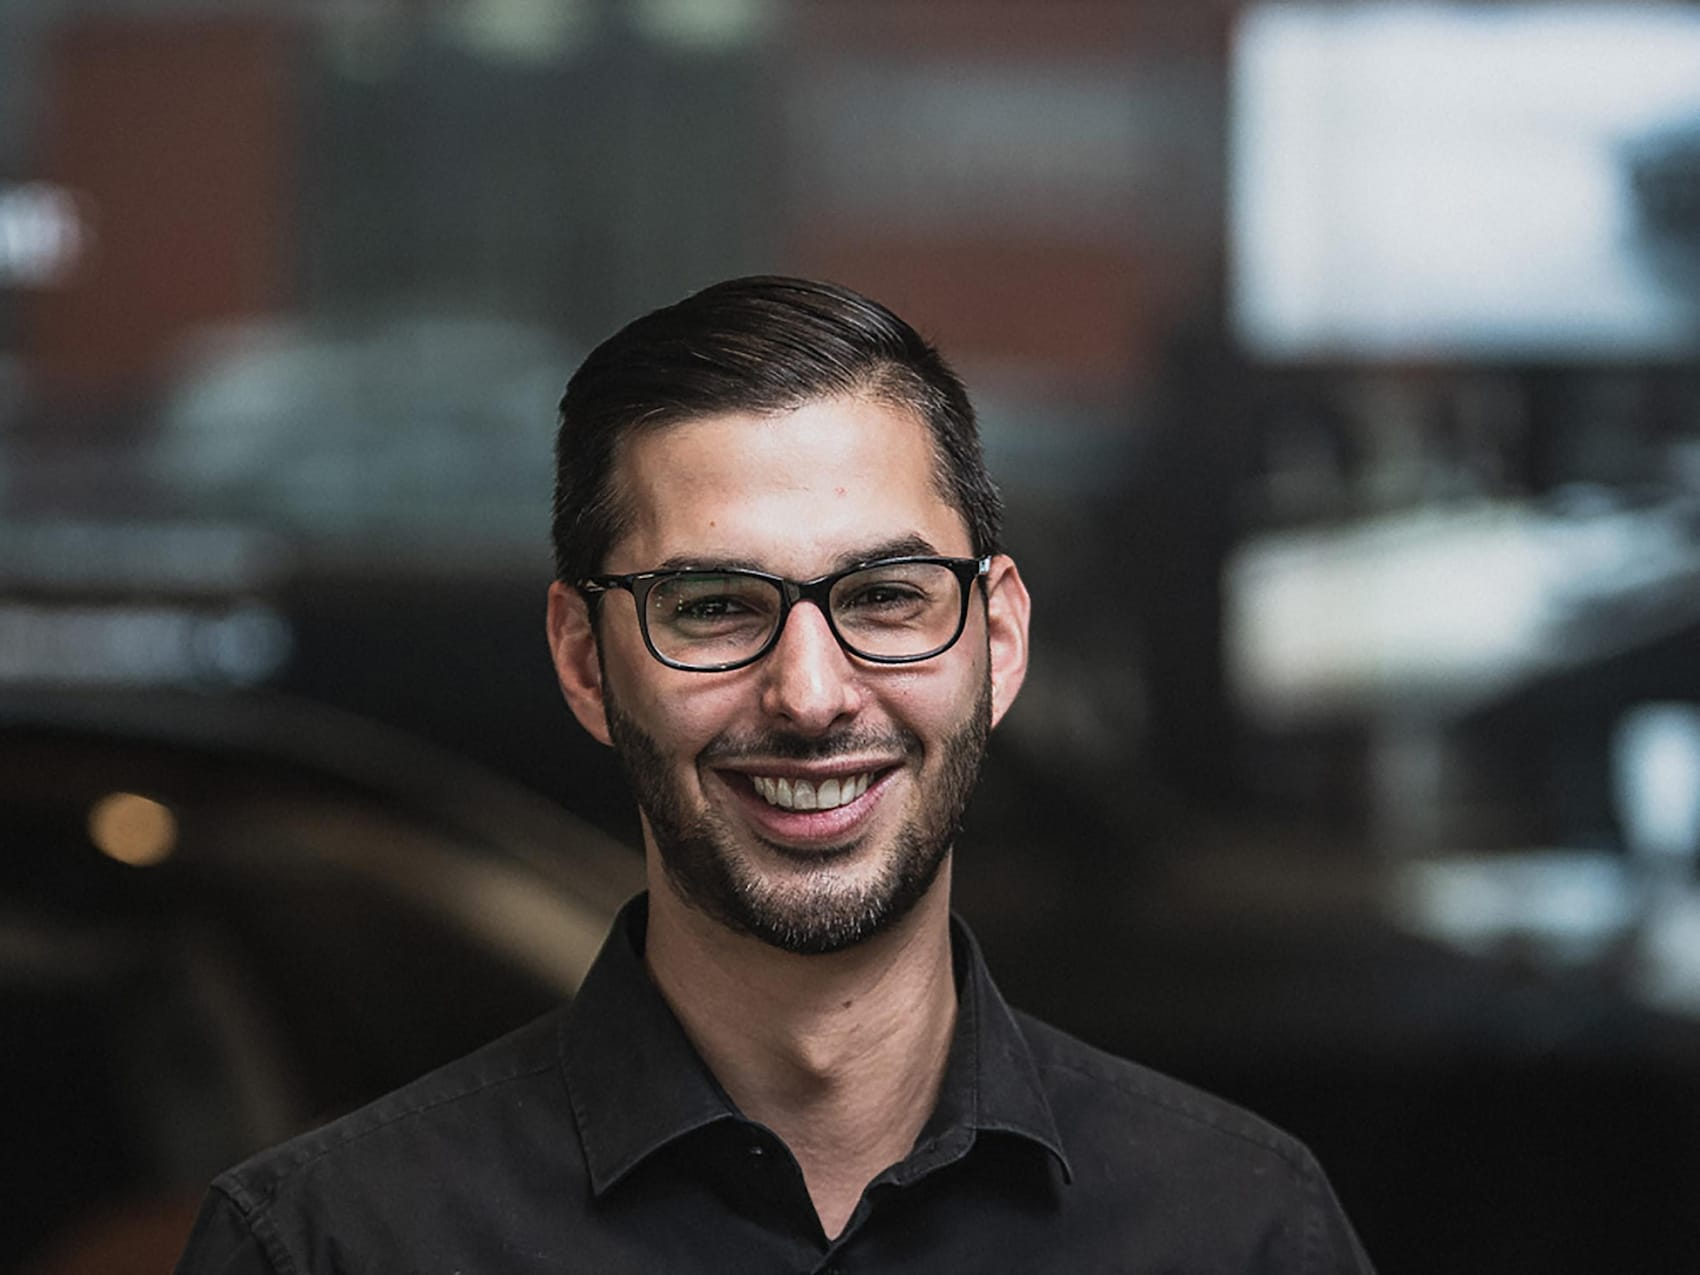 smart Center Allgäu - Mitarbeiter: Christopher Endres